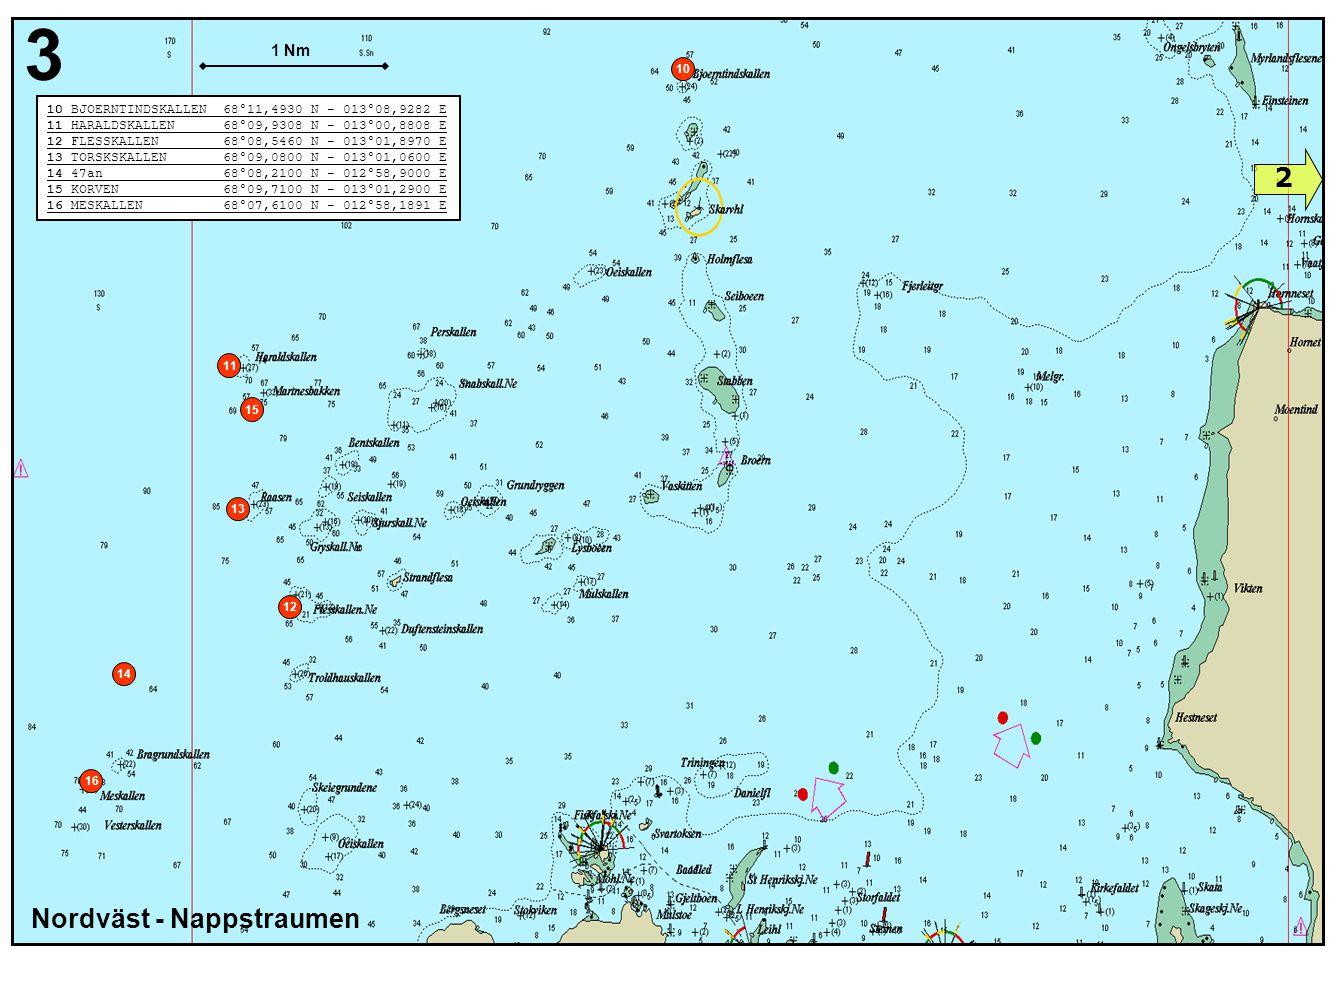 4 1 Syd - Nappstraumen 17 GRAENHOLMEN 68°04,4200 N - 013°27,9700 E